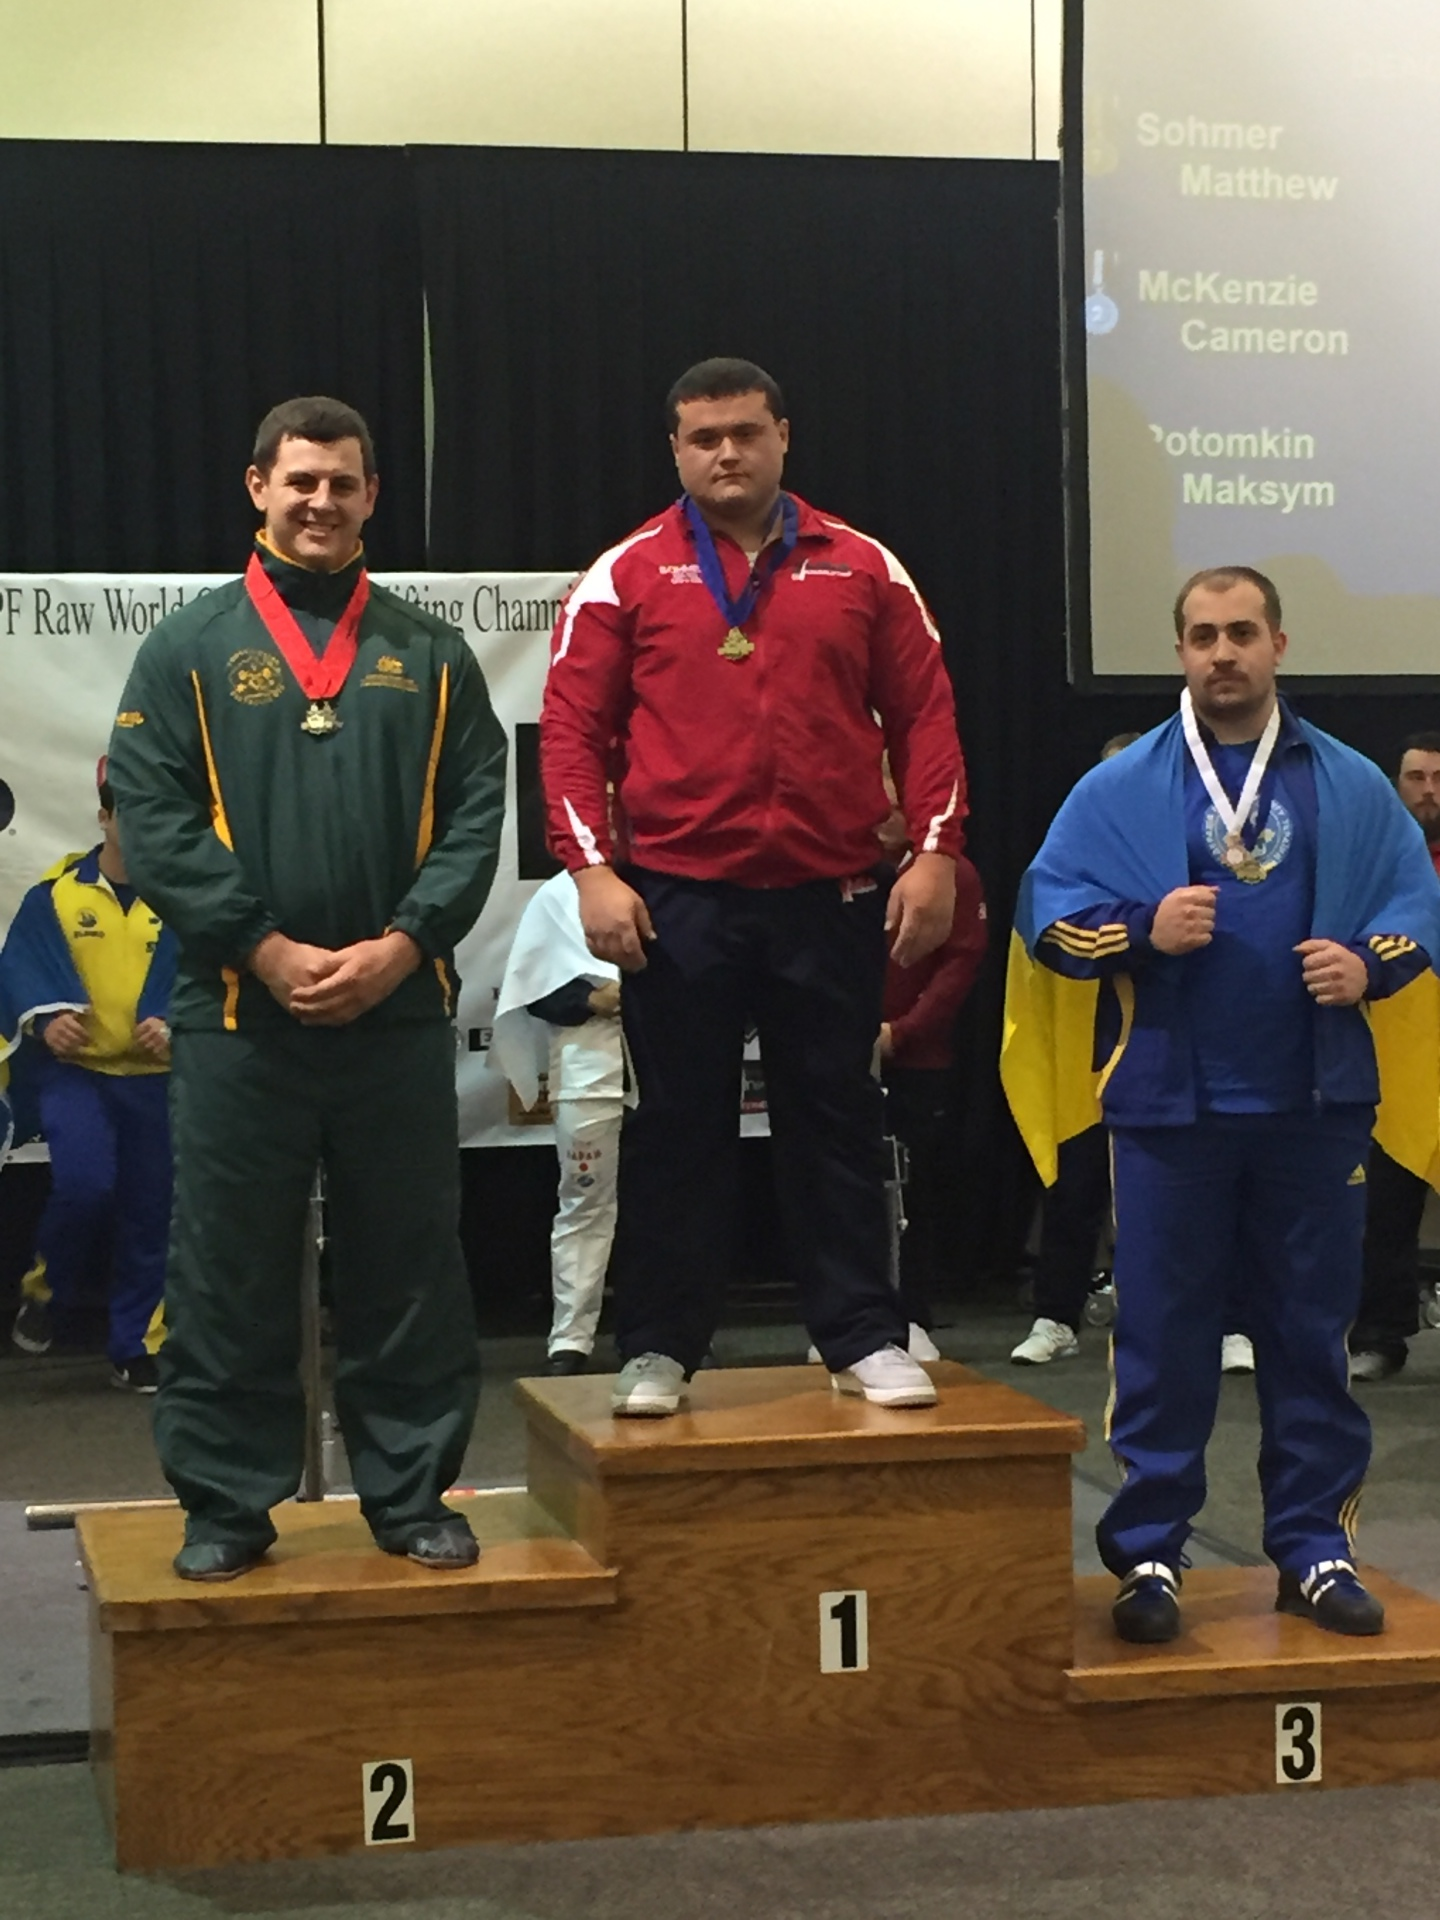 2016 IPF World Championship